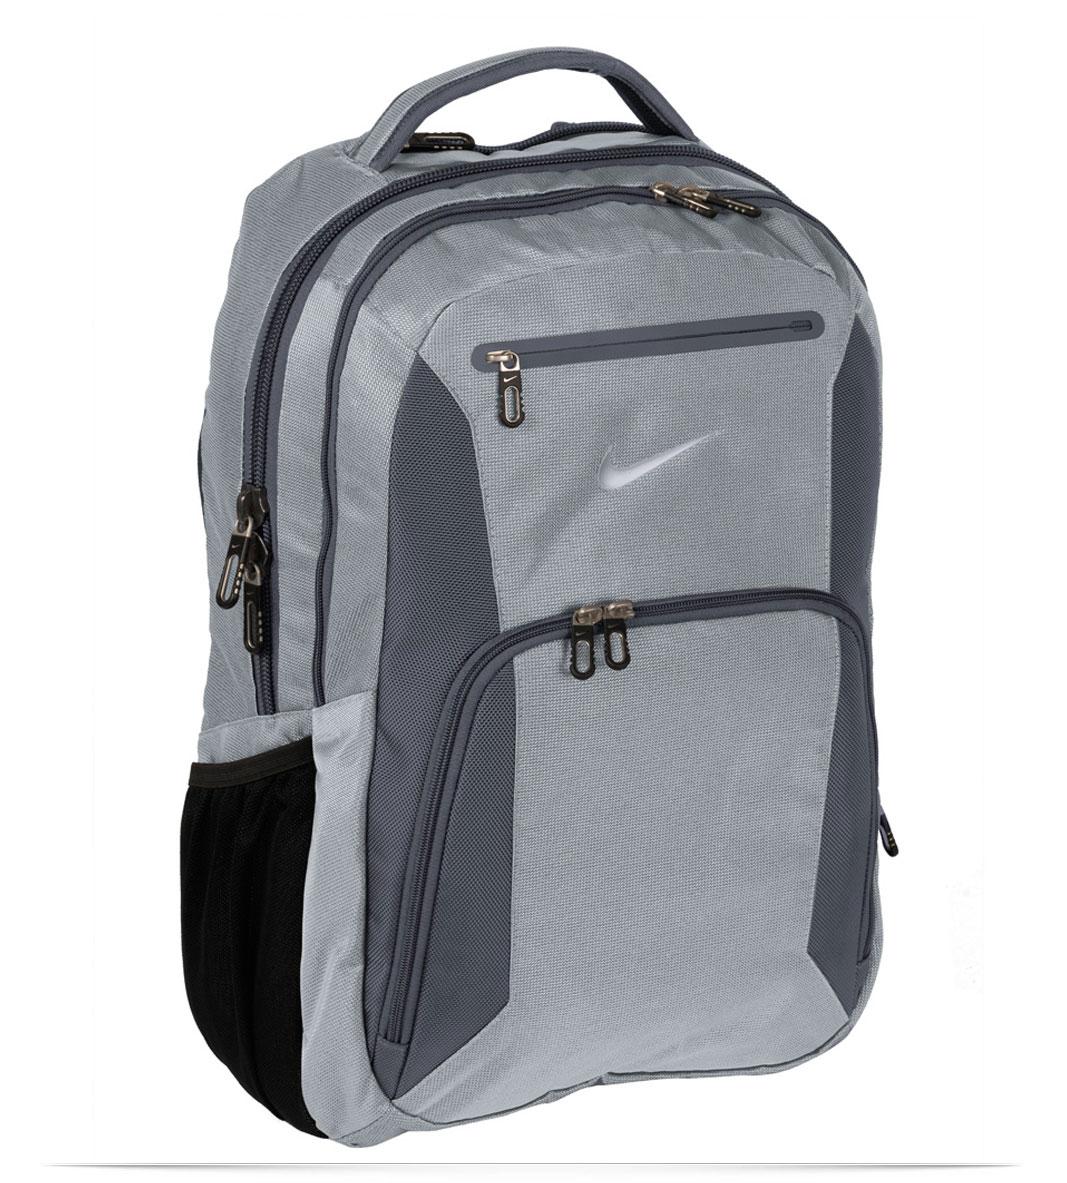 a85a460e748c Black And Gold Nike Hoops Backpack- Fenix Toulouse Handball